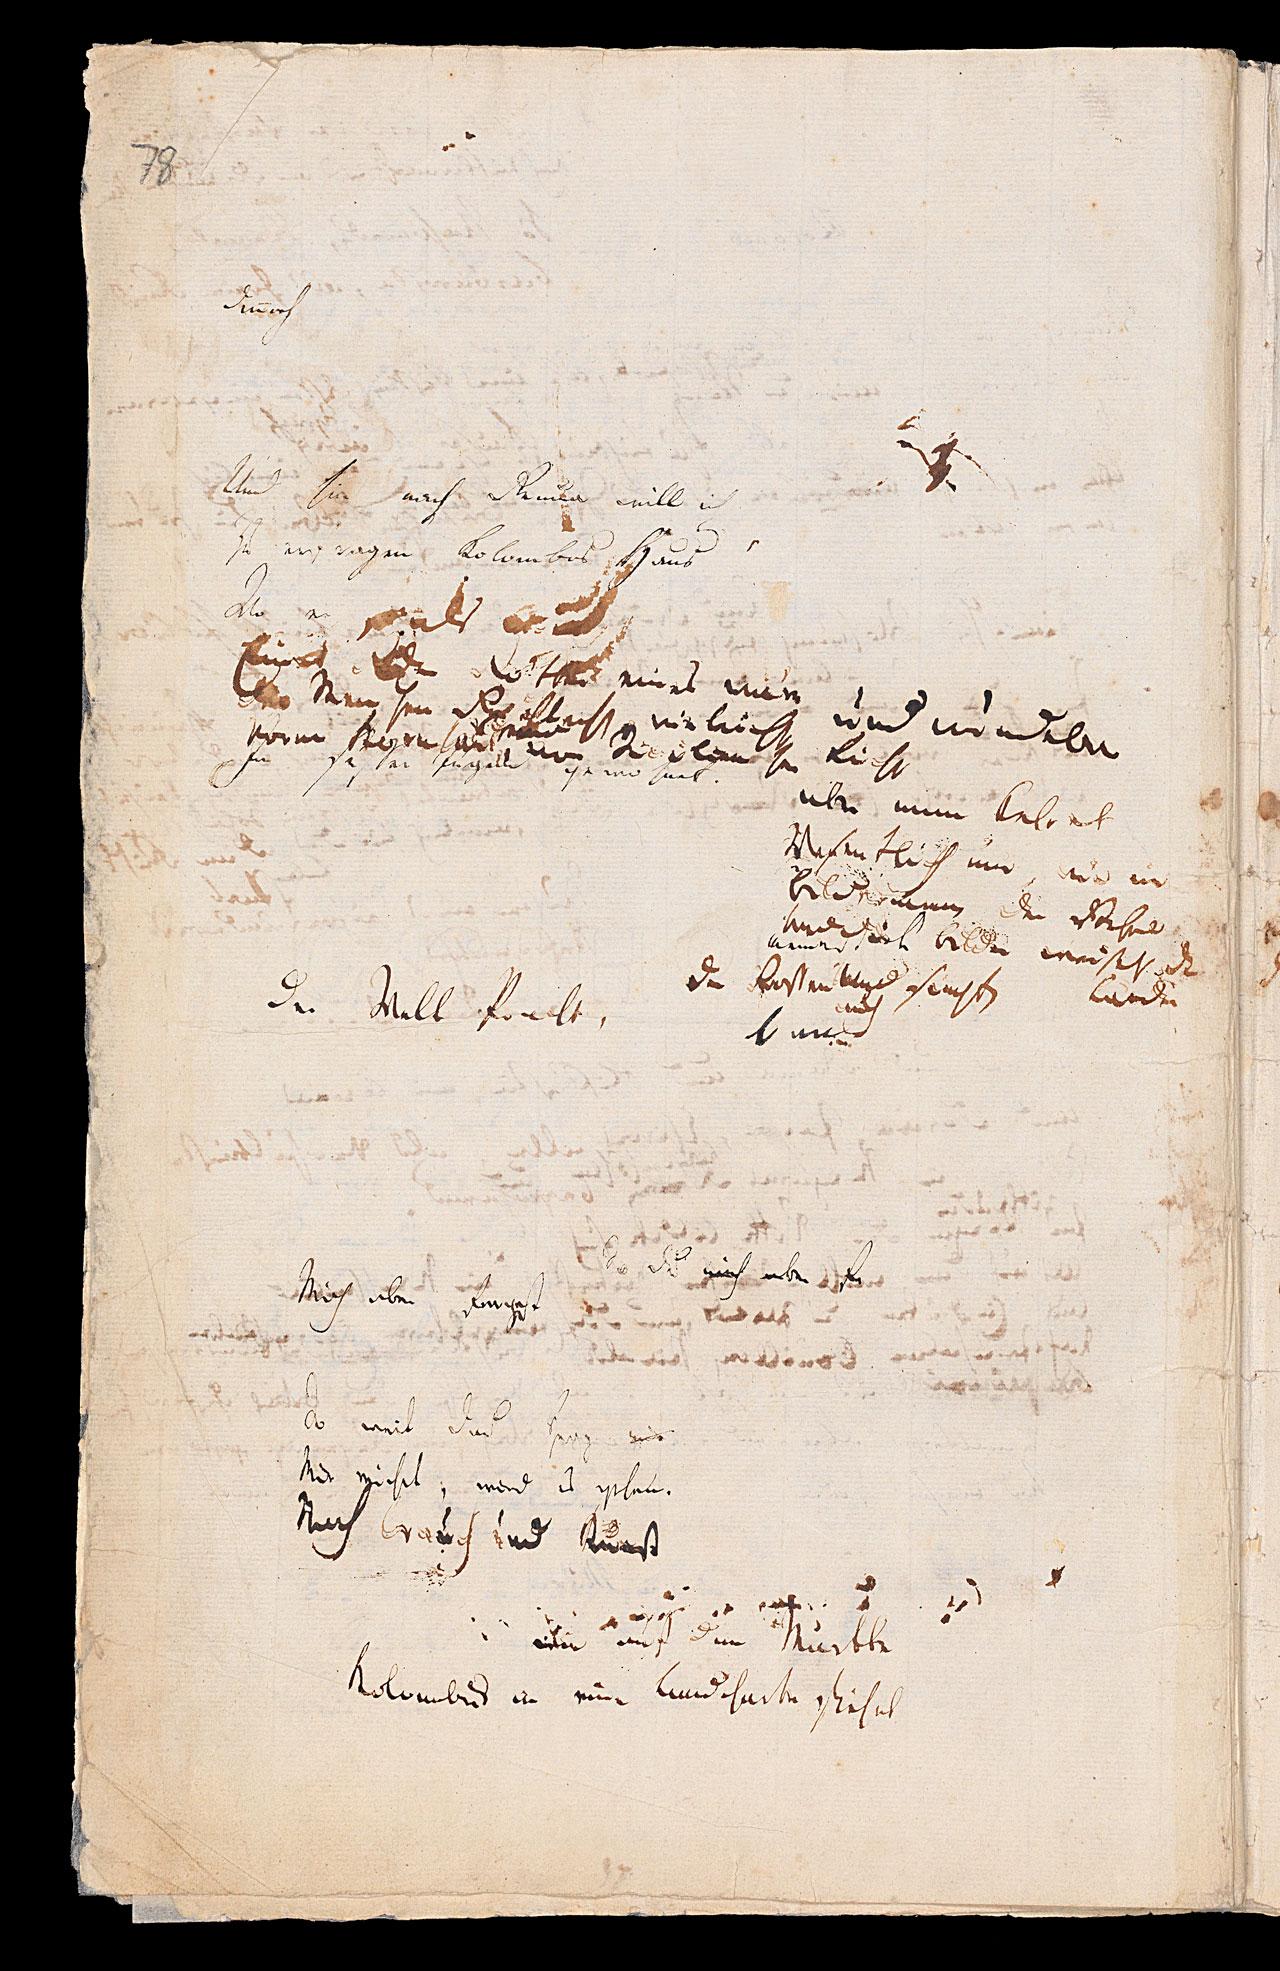 Friedrich Hölderlin, Homburger Folioheft, Seite 78, Kolomb, Handschrift